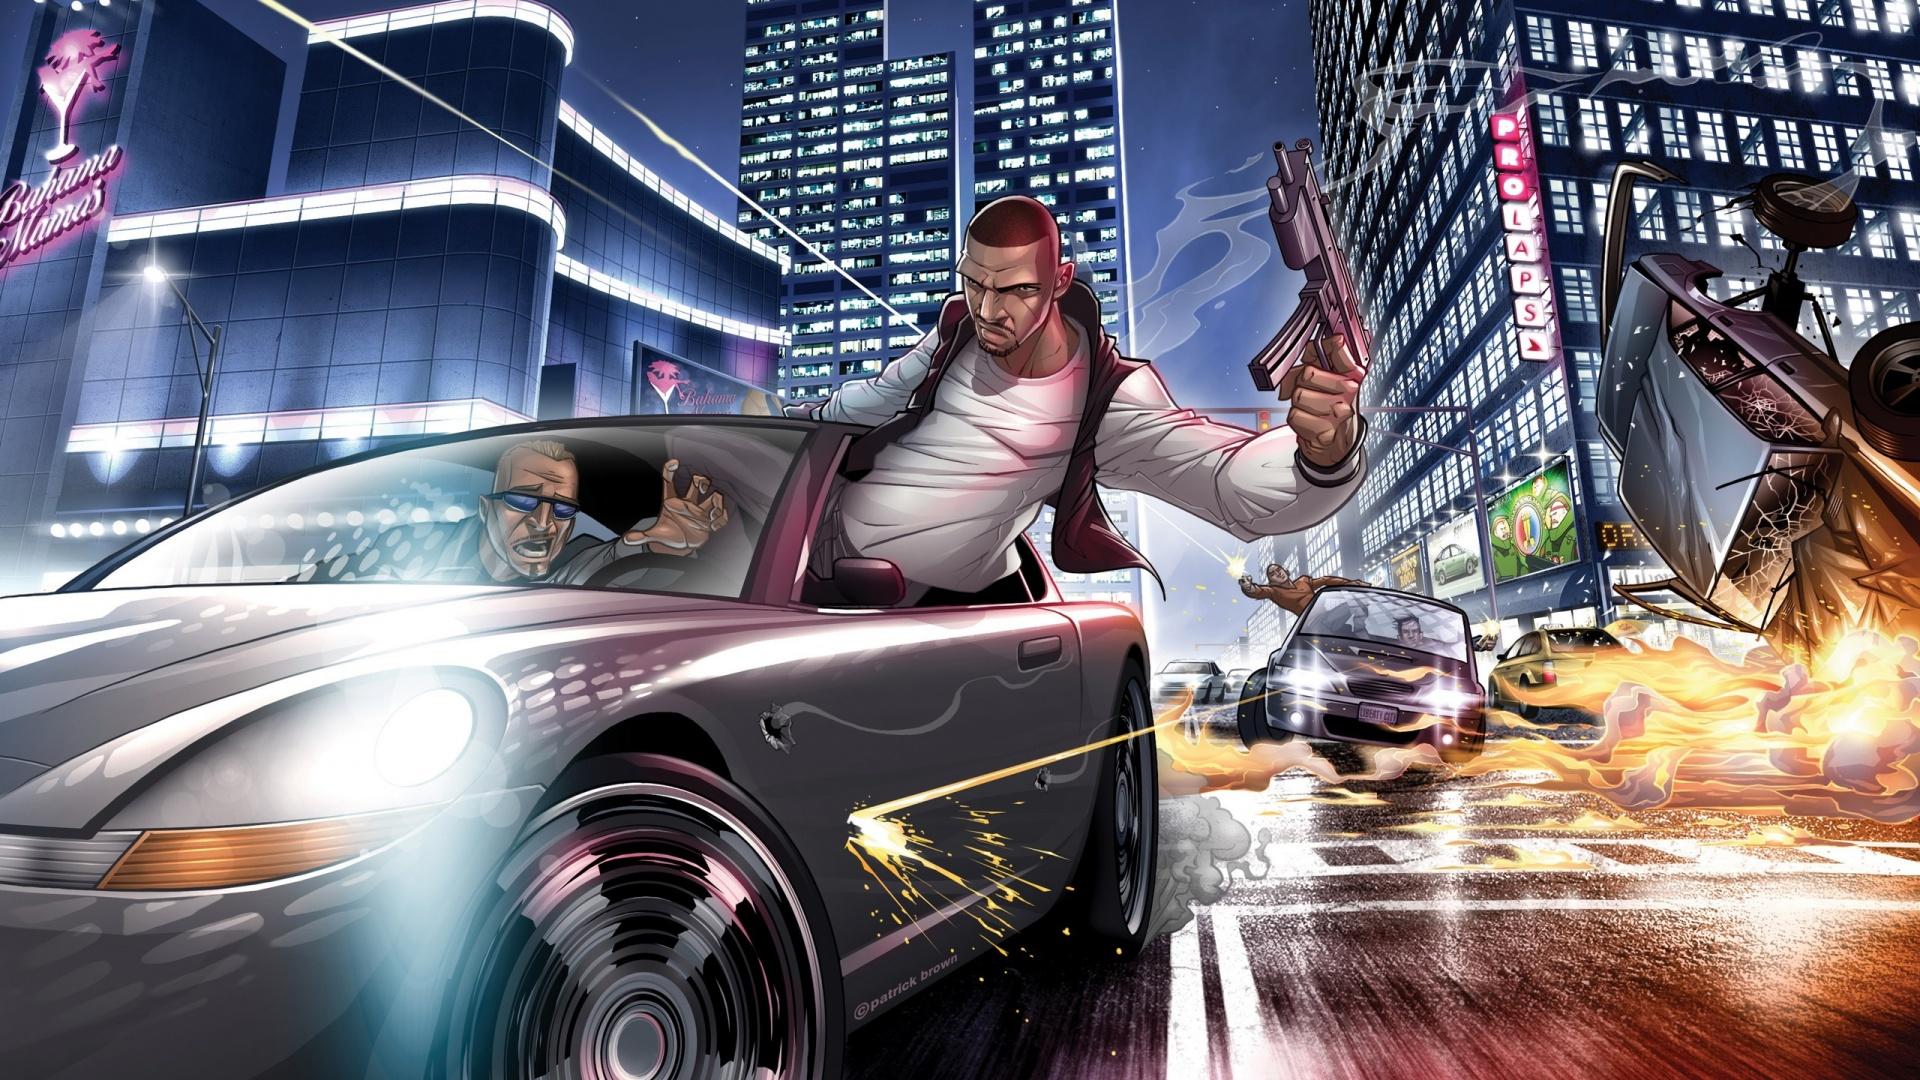 Download Grand Theft Auto IV Art HD Wallpaper Wallpapers 1920x1080